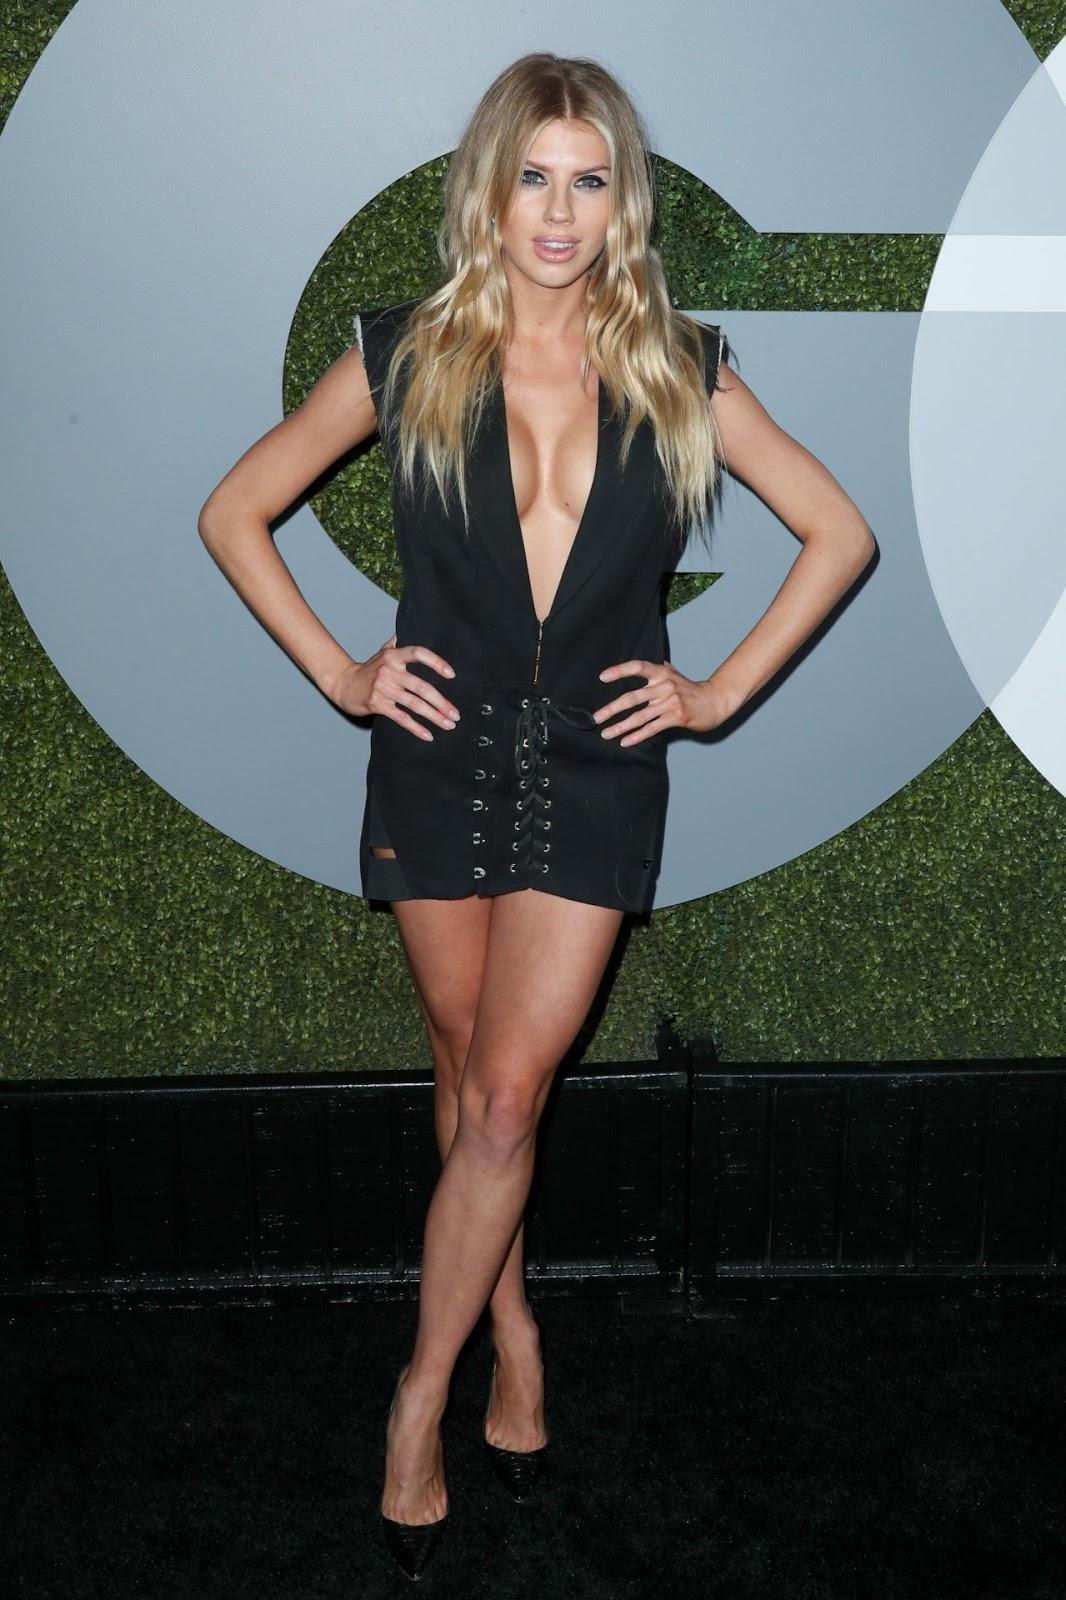 Charlotte McKinney @Char_mck Flaunts Her Bikini Body in